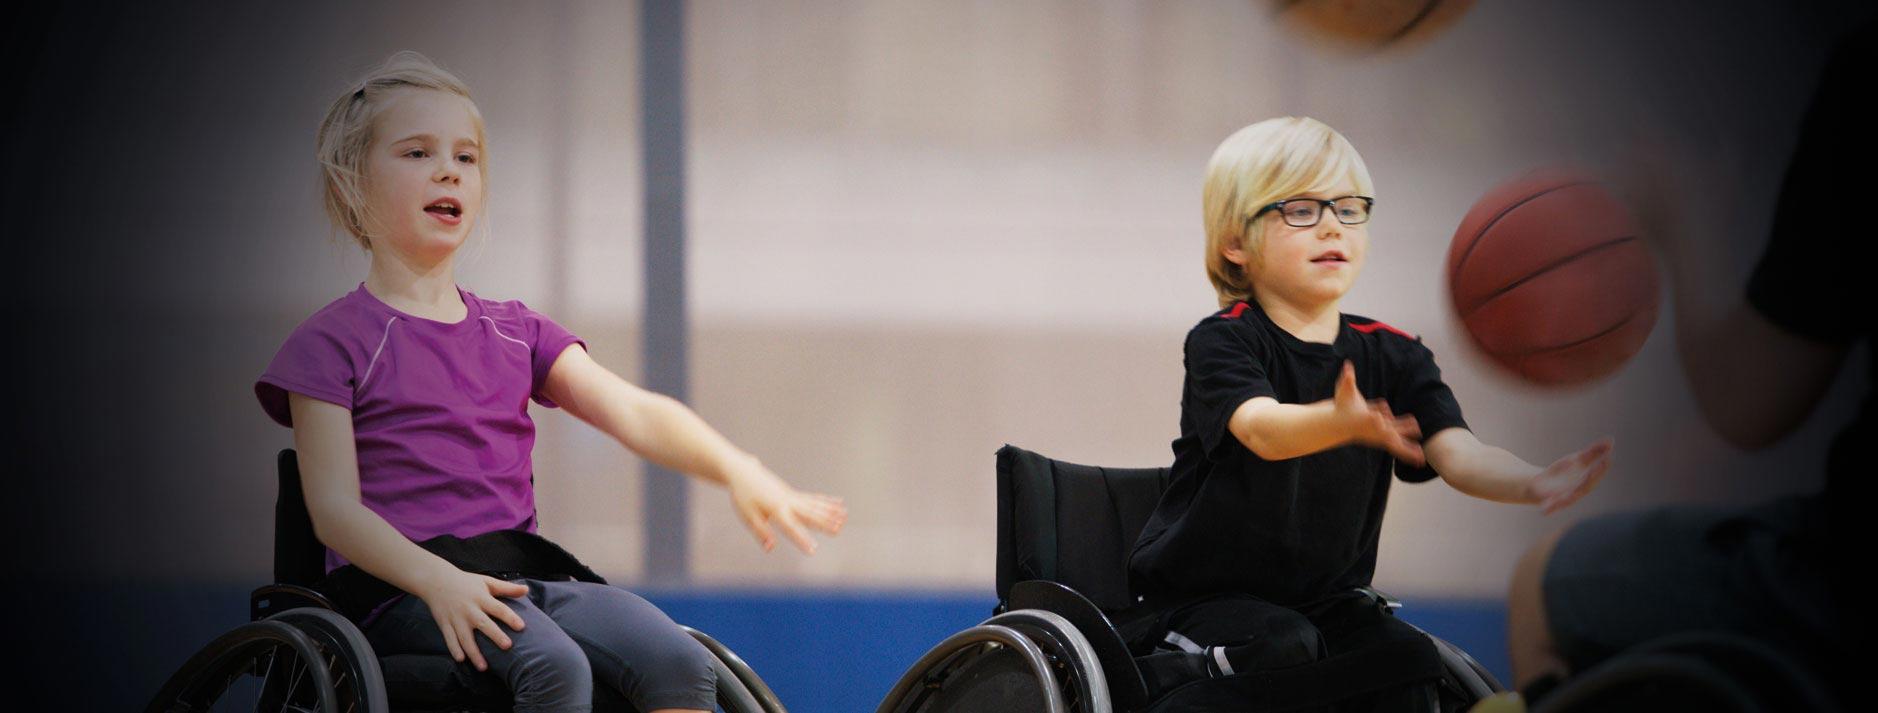 Kids playing wheelchair basketball